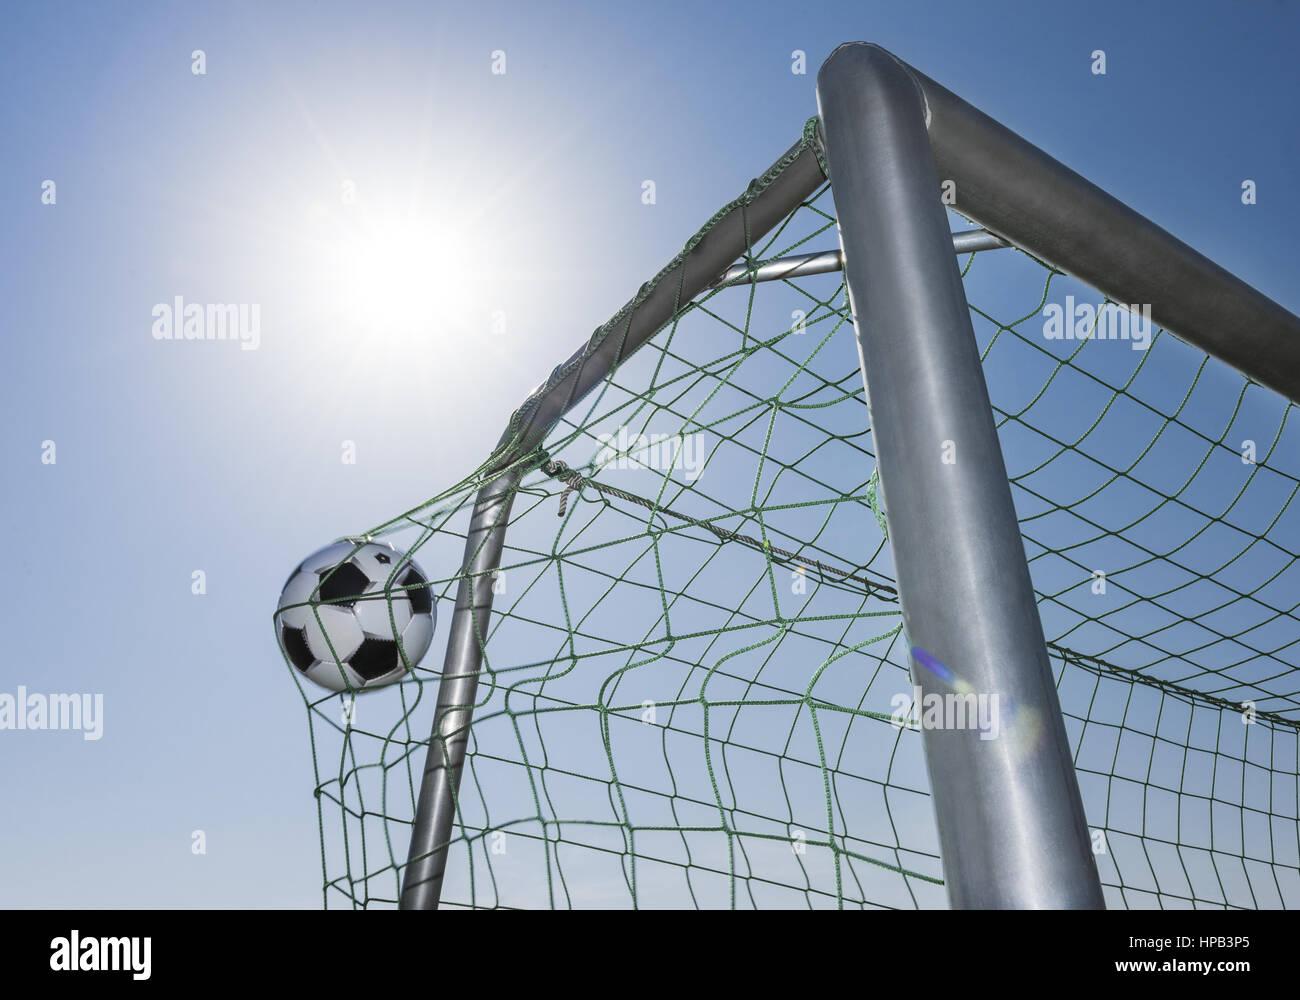 fussball fliegt ins tor stockfotografie  alamy